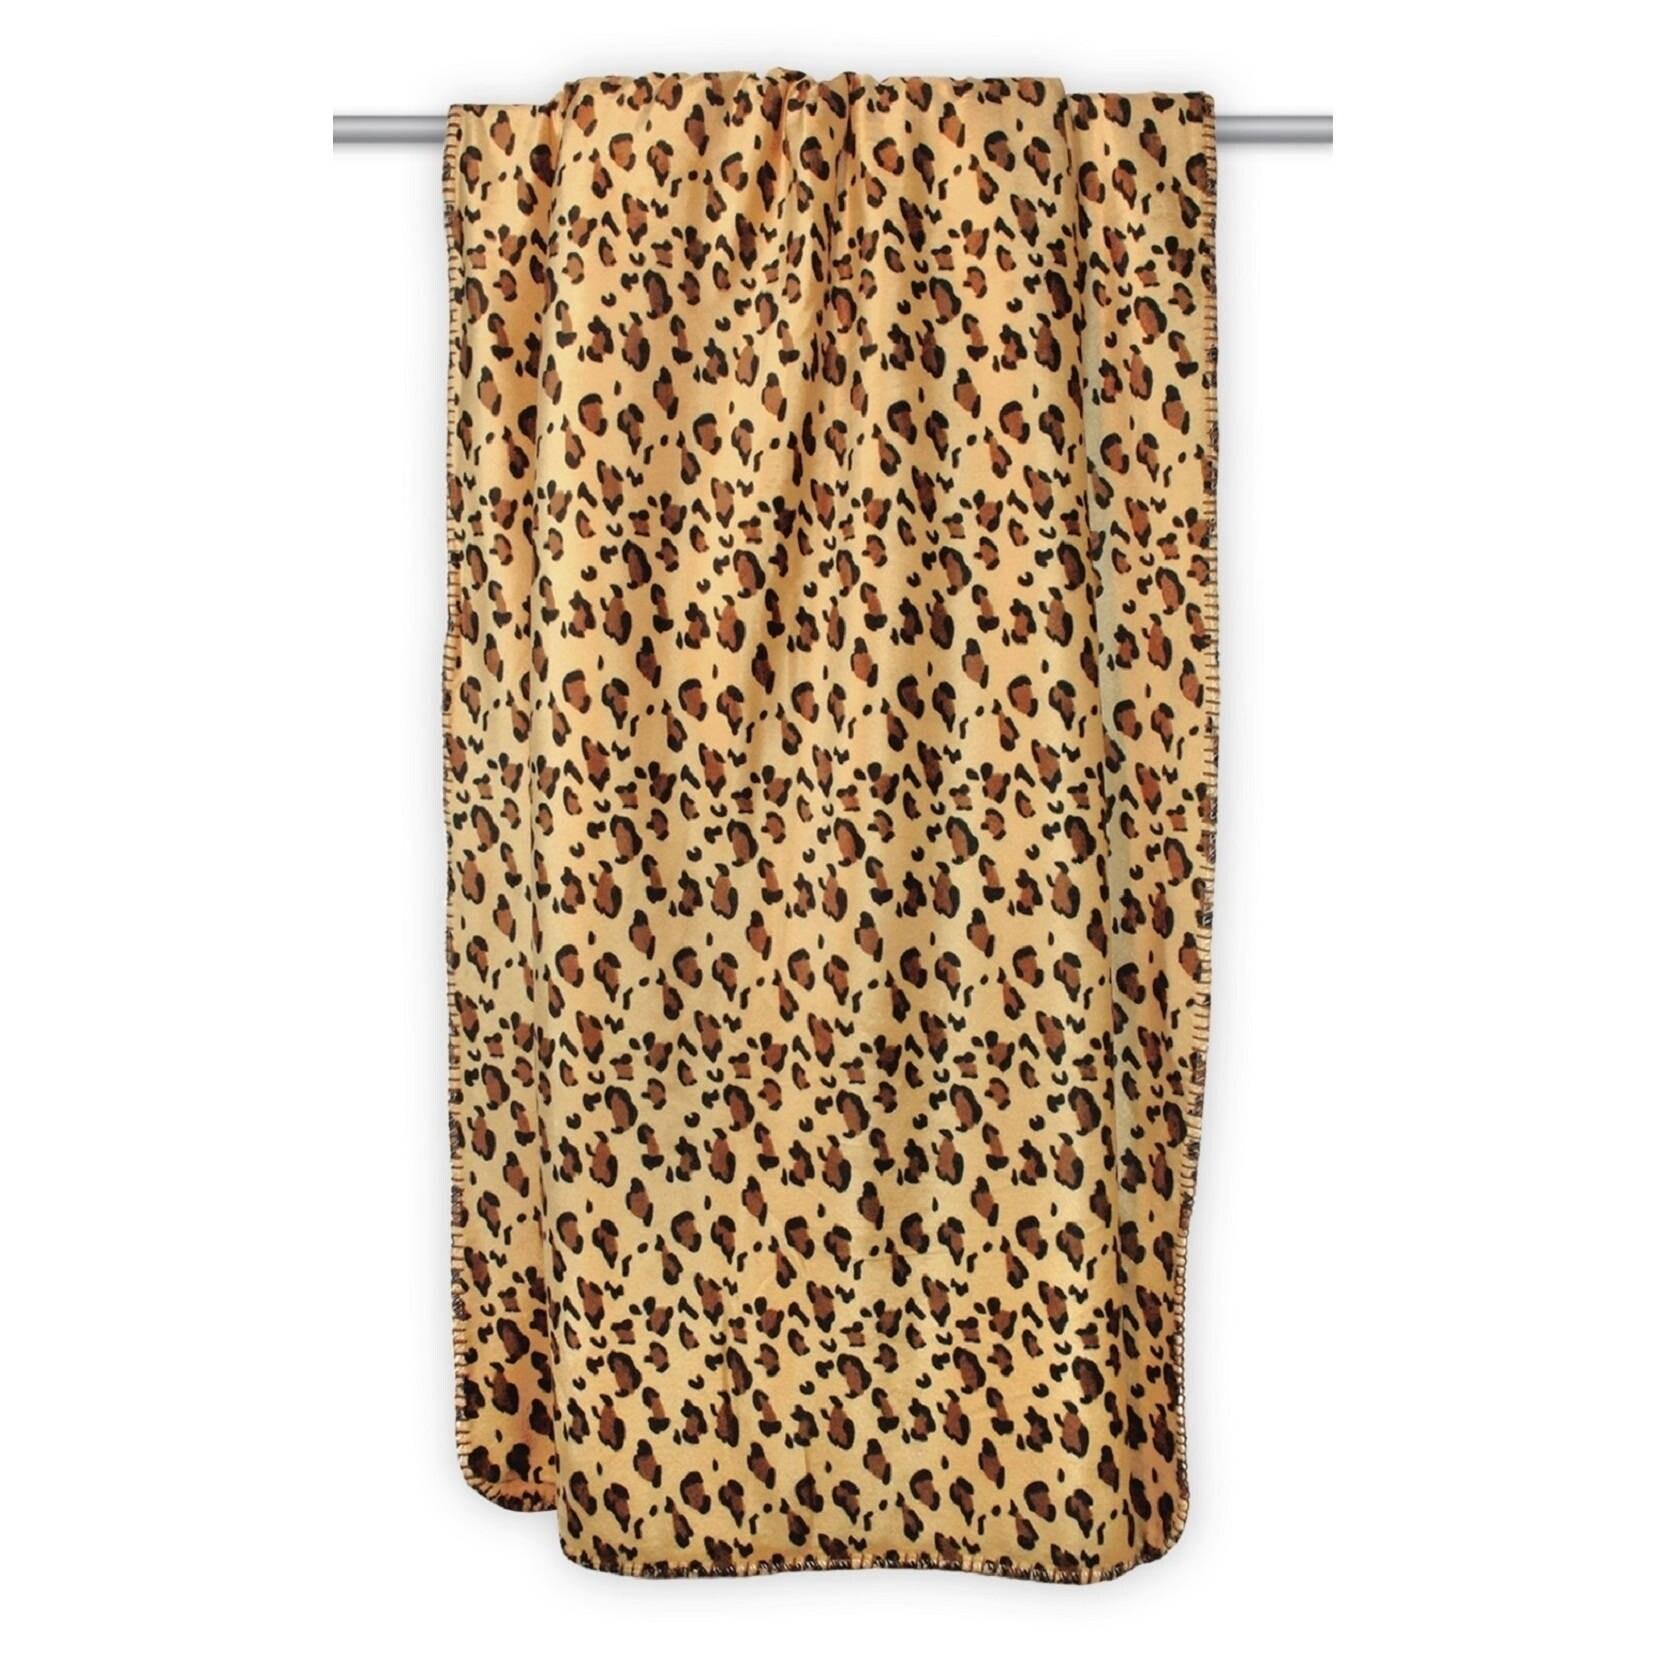 Leopard Sherpa Throw, Black (Polyester, Animal Print)